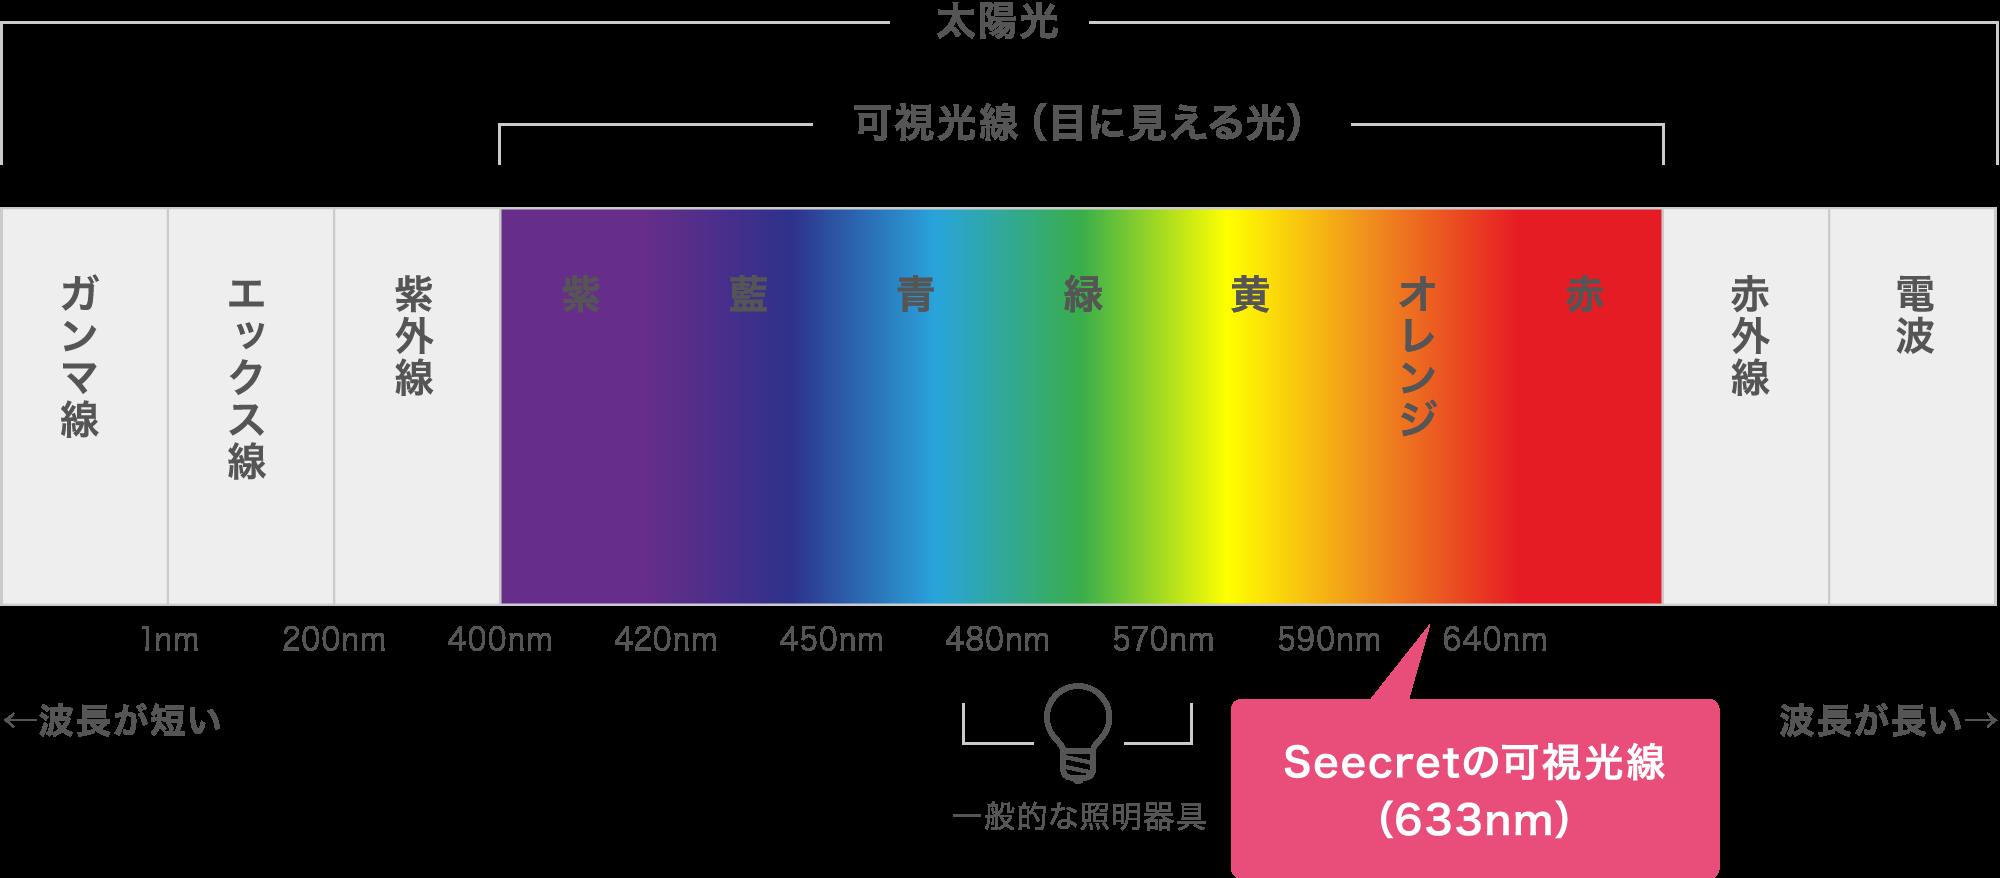 Seecretの可視光線の図(633nm)